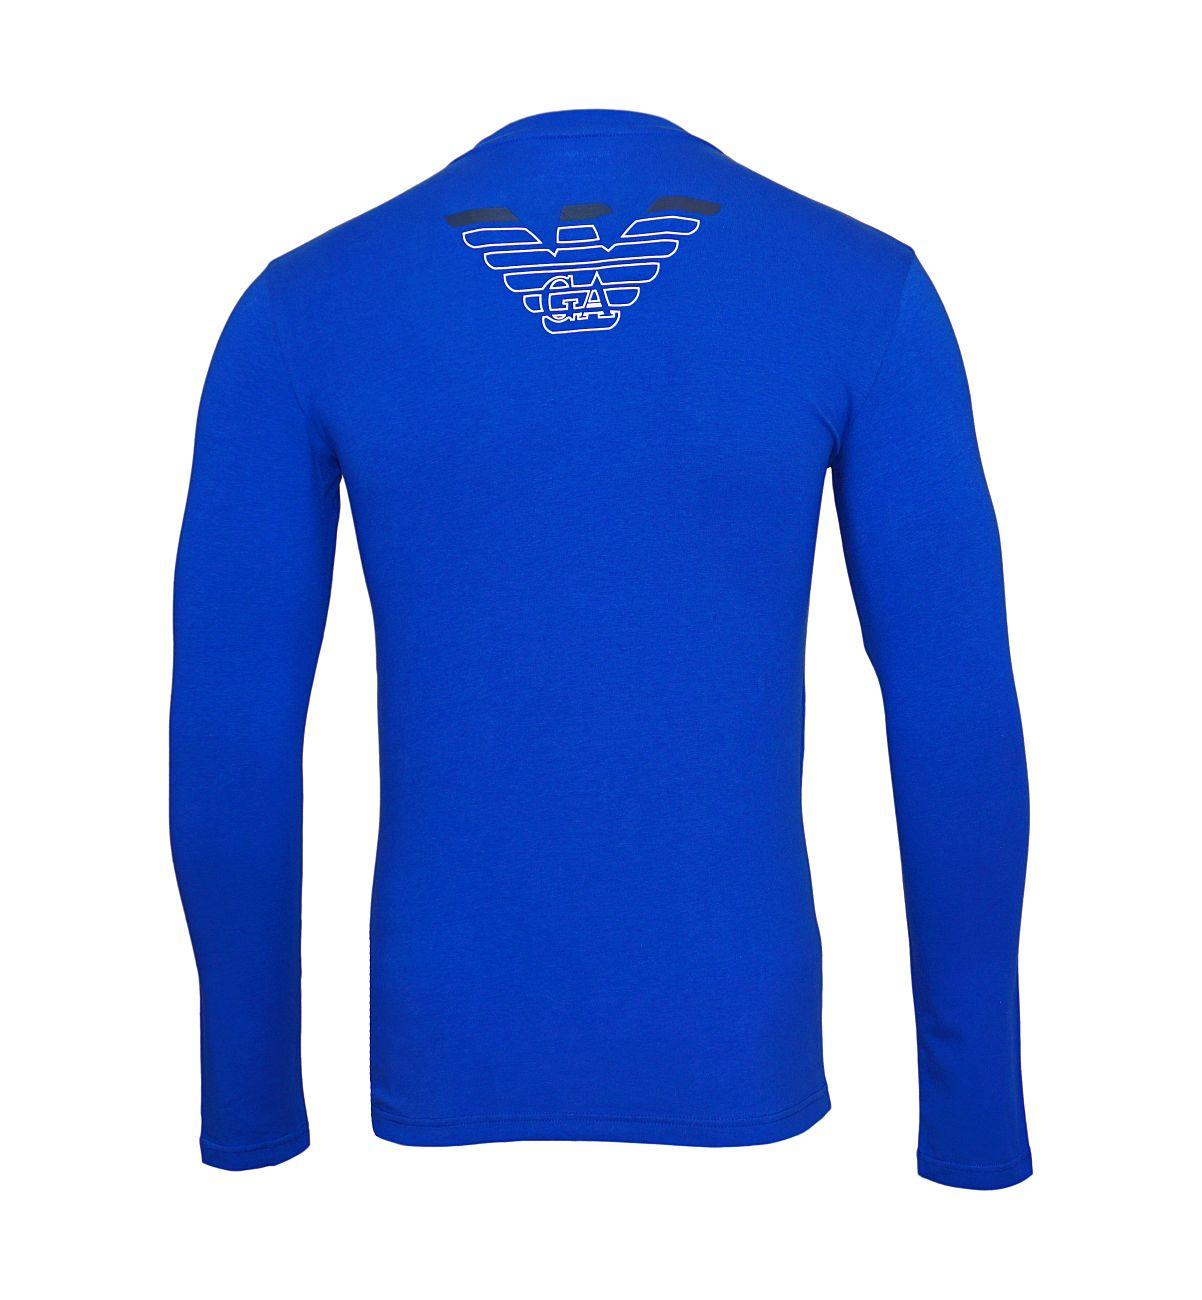 Emporio Armani Longsleeve Rundhals Shirt 111023 8A725 23233 MAZARINE WX18-EAL